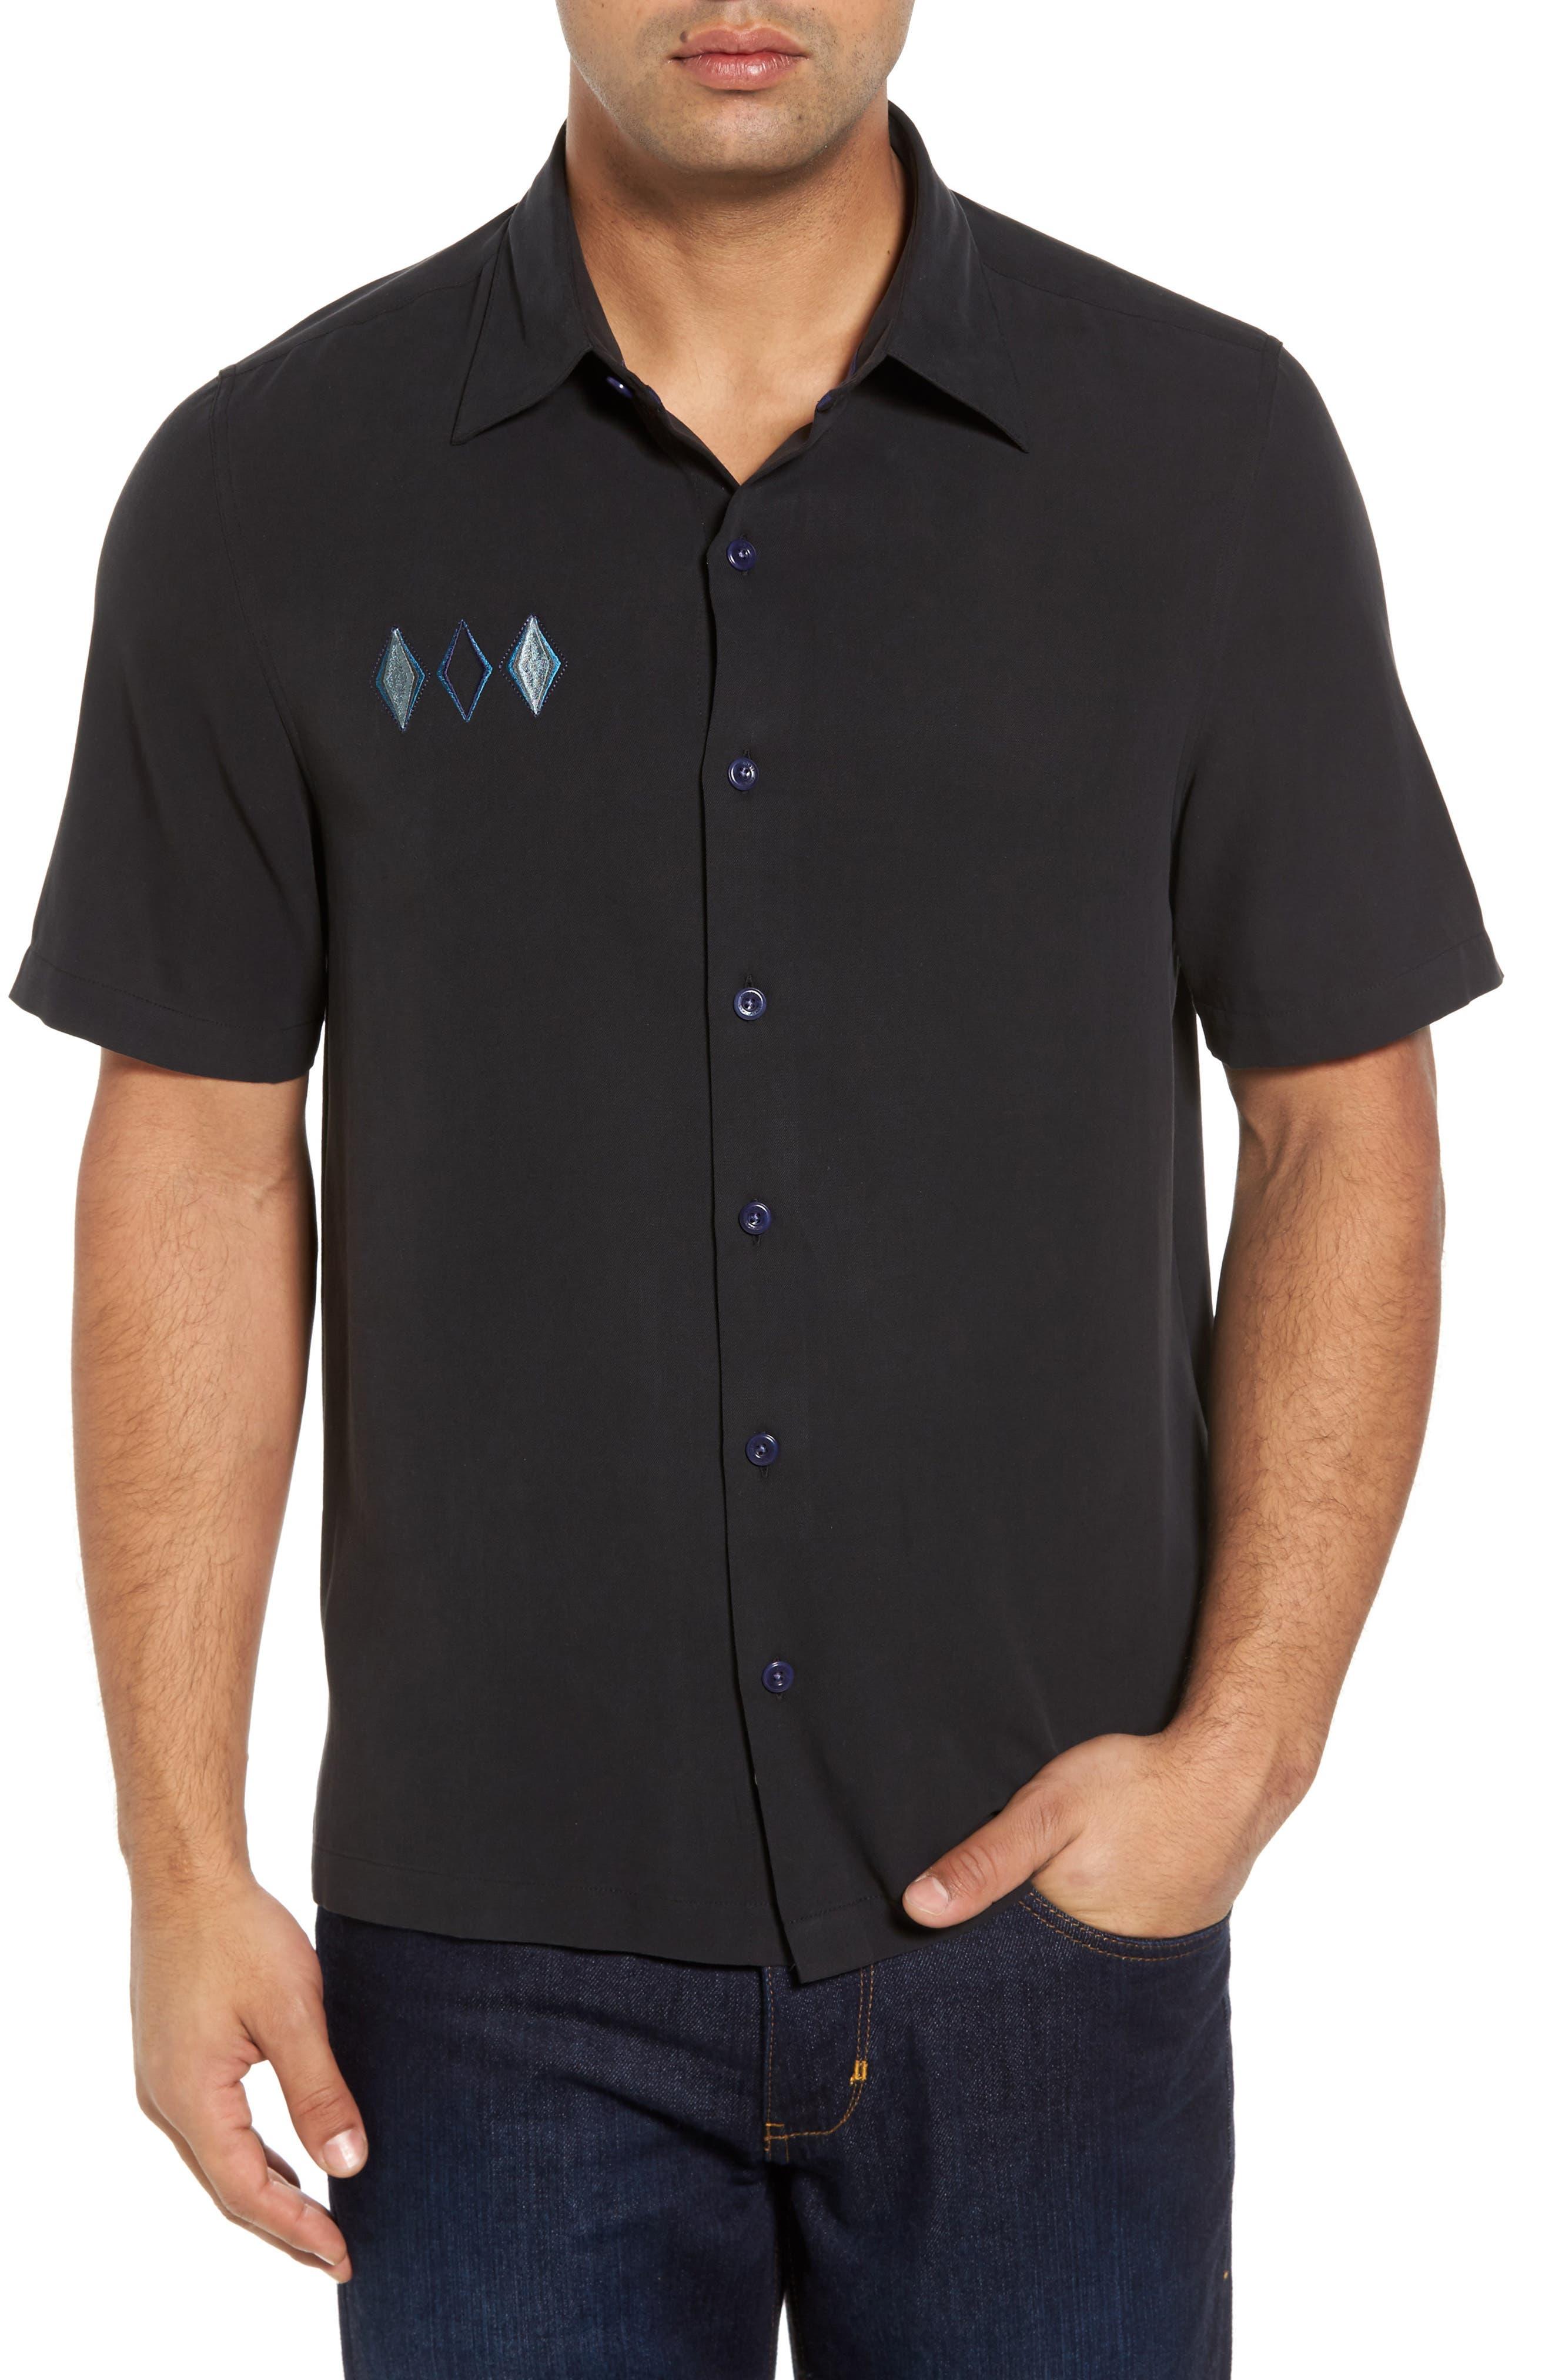 Black Diamond Regular Fit Embroidered Silk Blend Sport Shirt,                             Main thumbnail 1, color,                             001